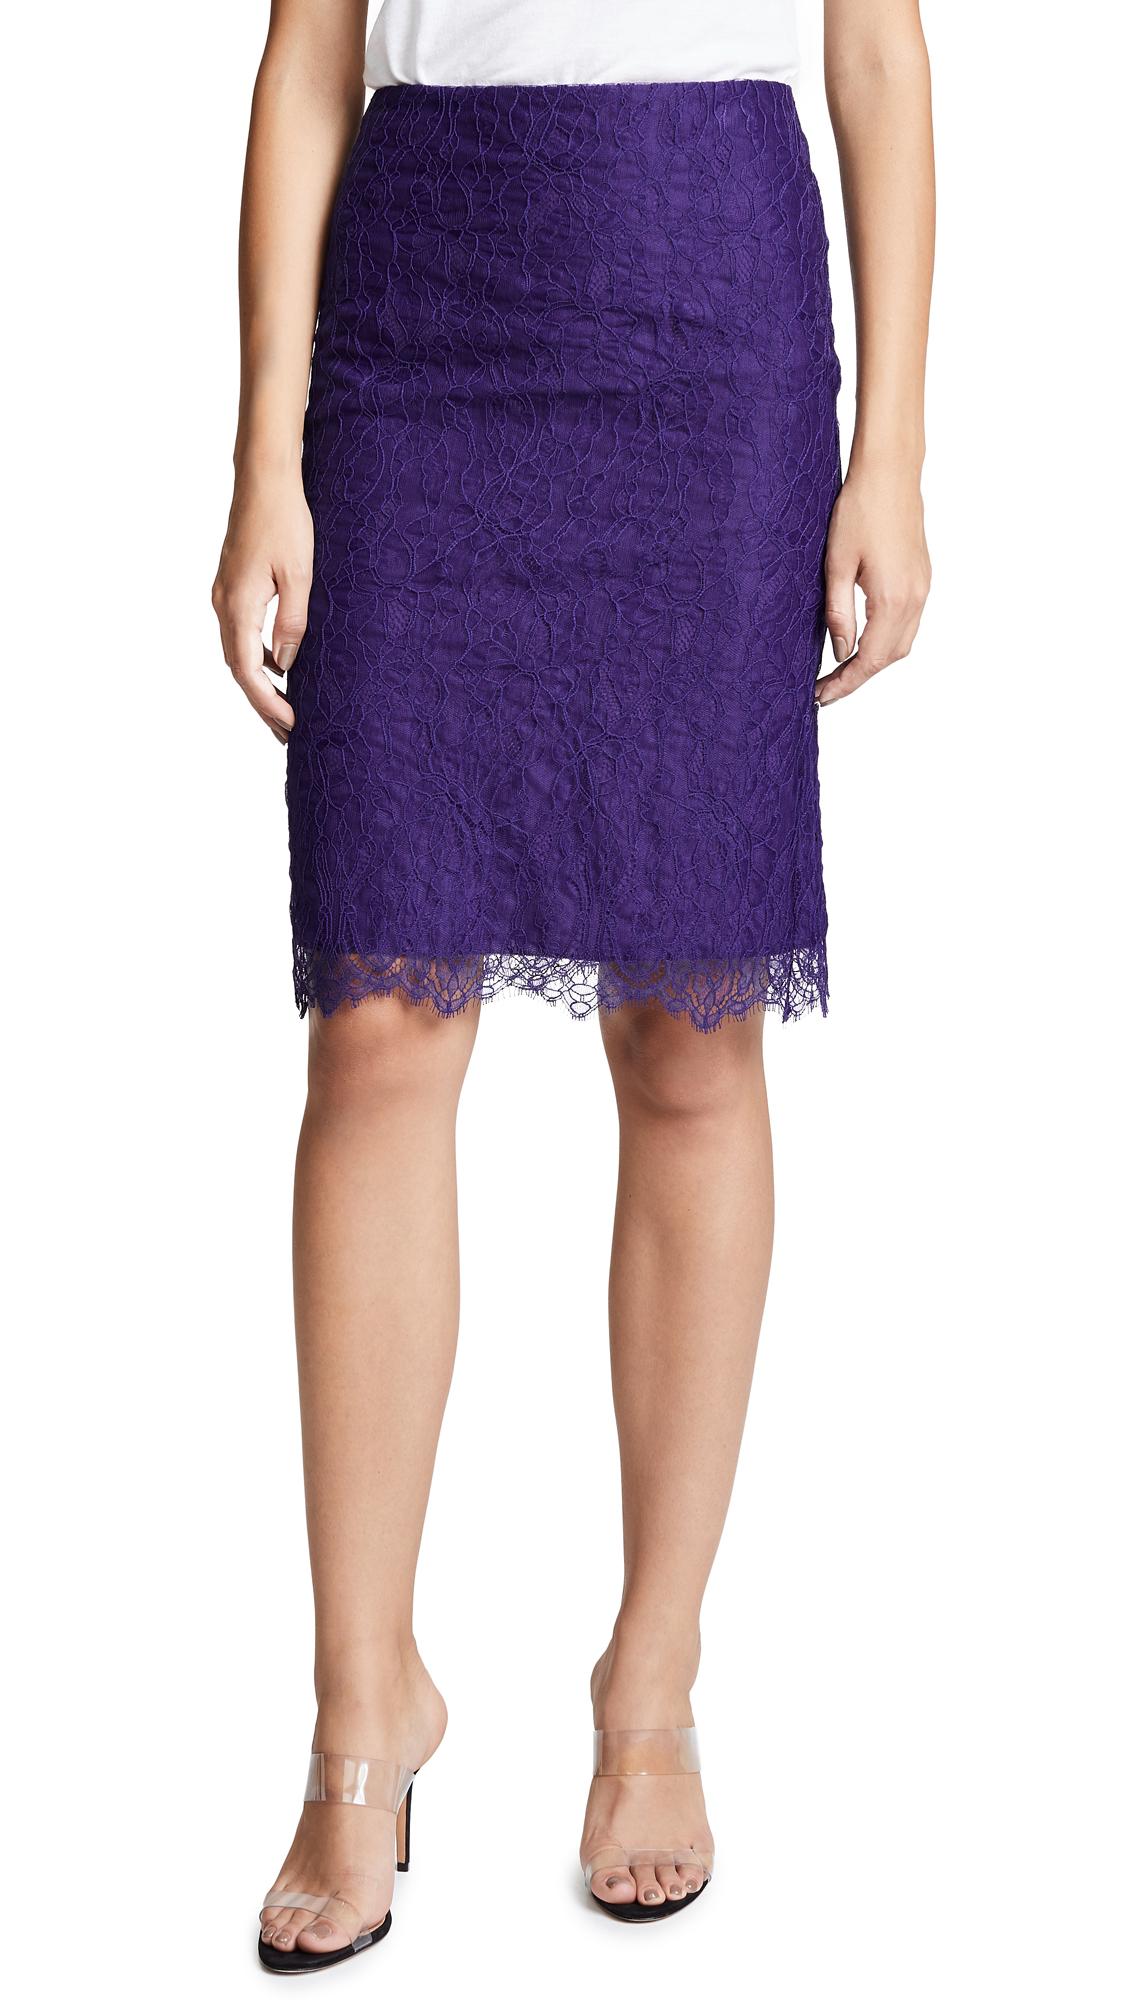 Nina Ricci Lace Mini Skirt - Purple